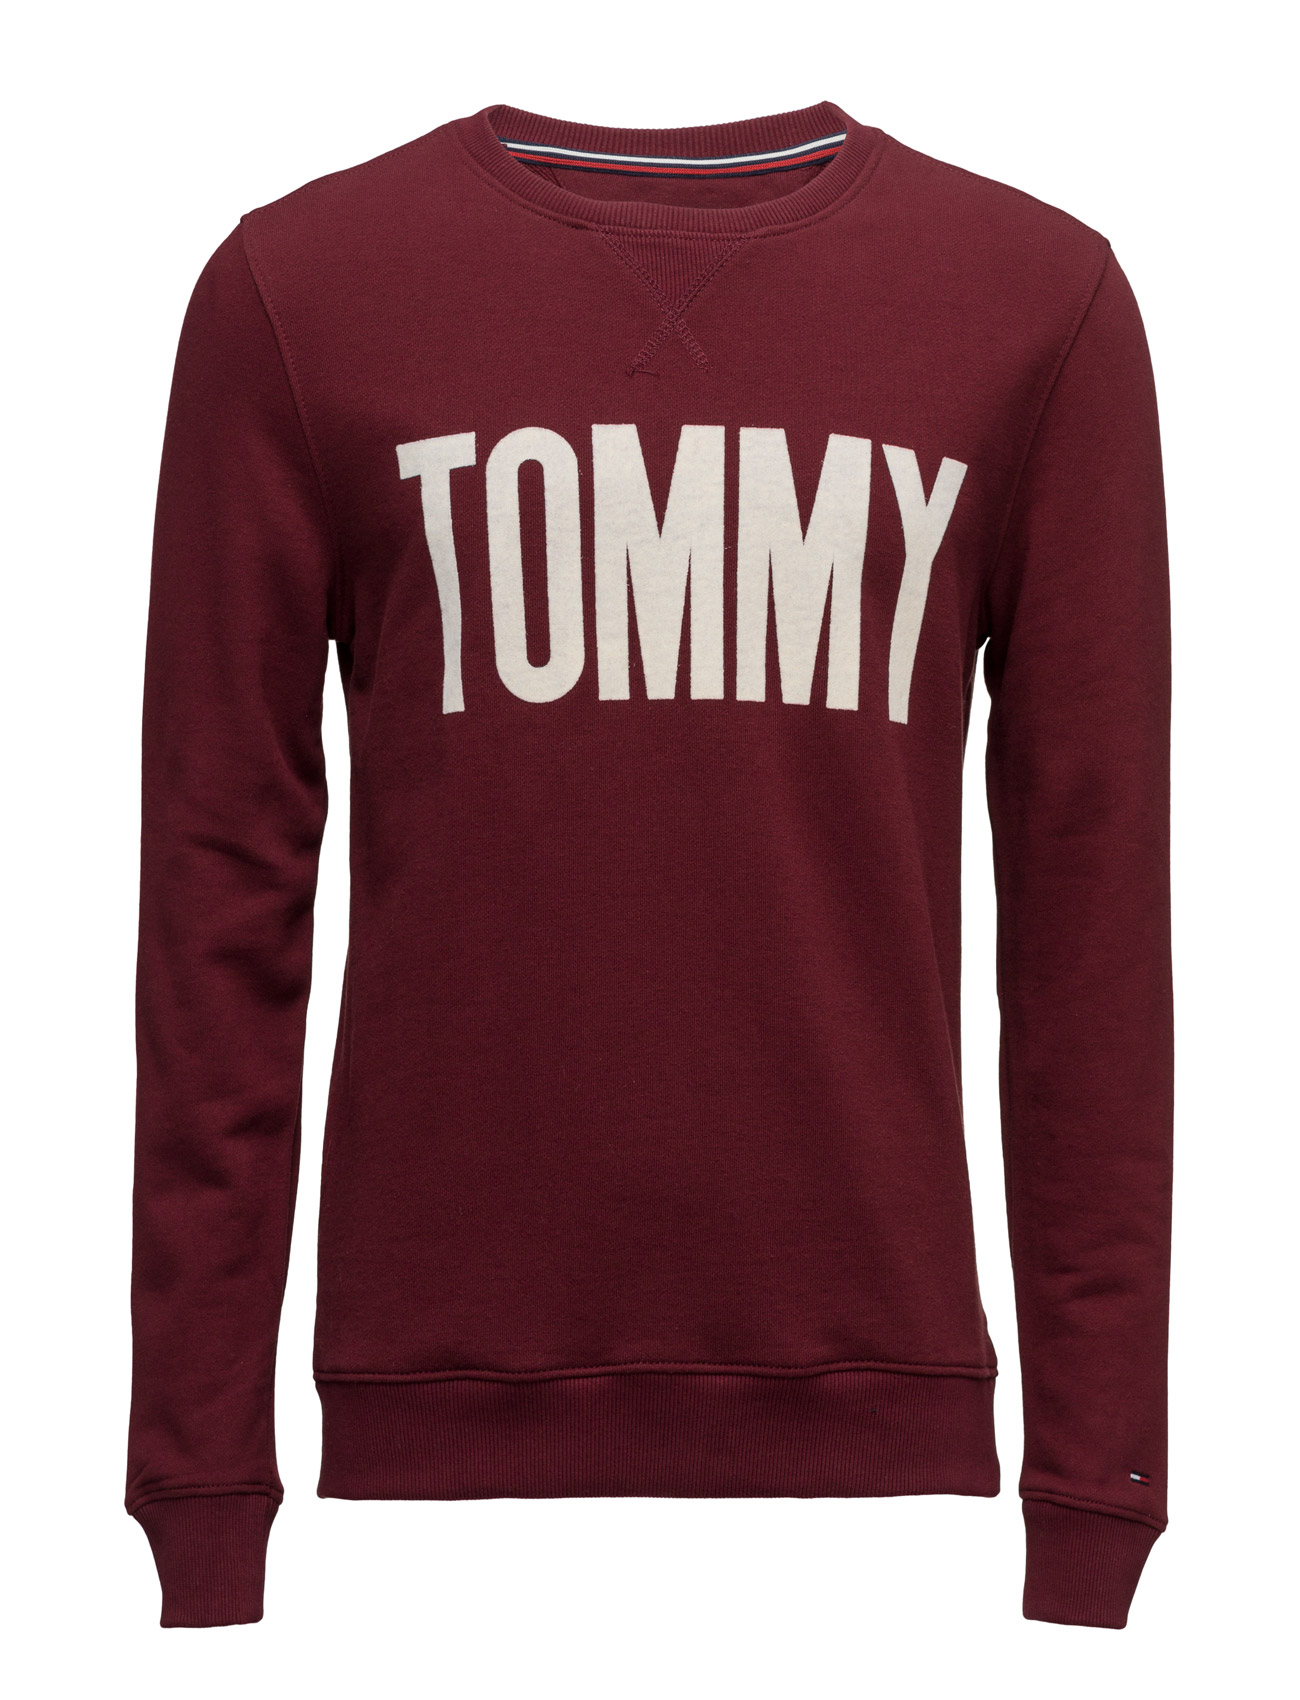 Tommy Jeans THDM BASIC LOGO CN HKNIT 11